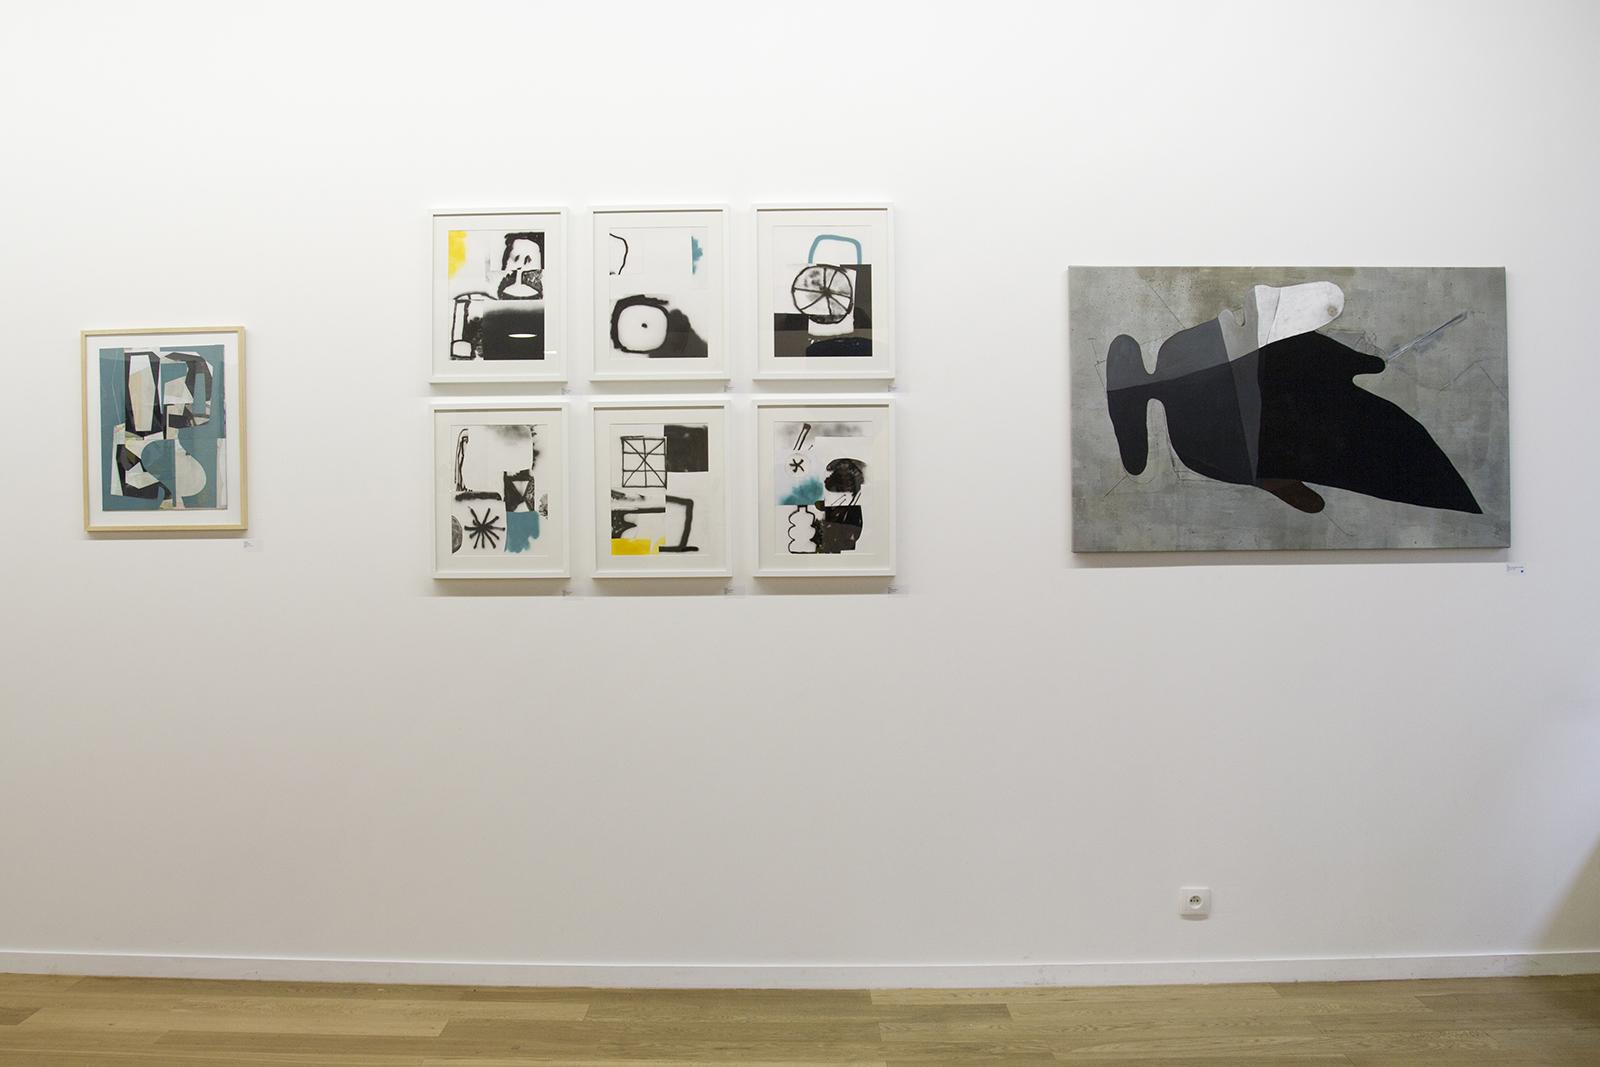 108-ekta-erosie-nelio-at-galerie-slika-recap-03